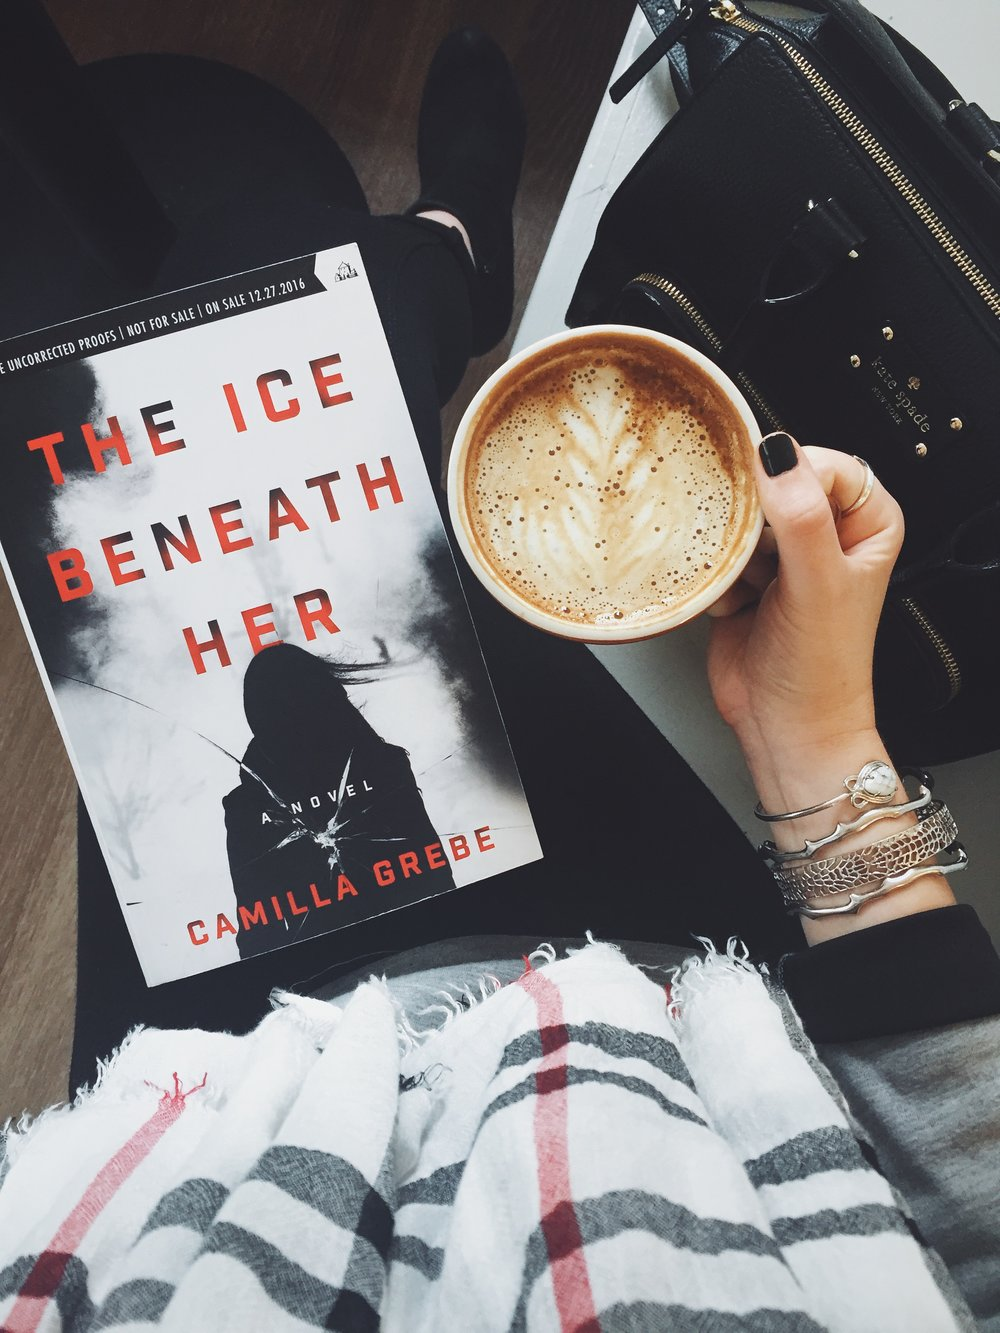 The Ice Beneath Her Camilla Grebe.JPG